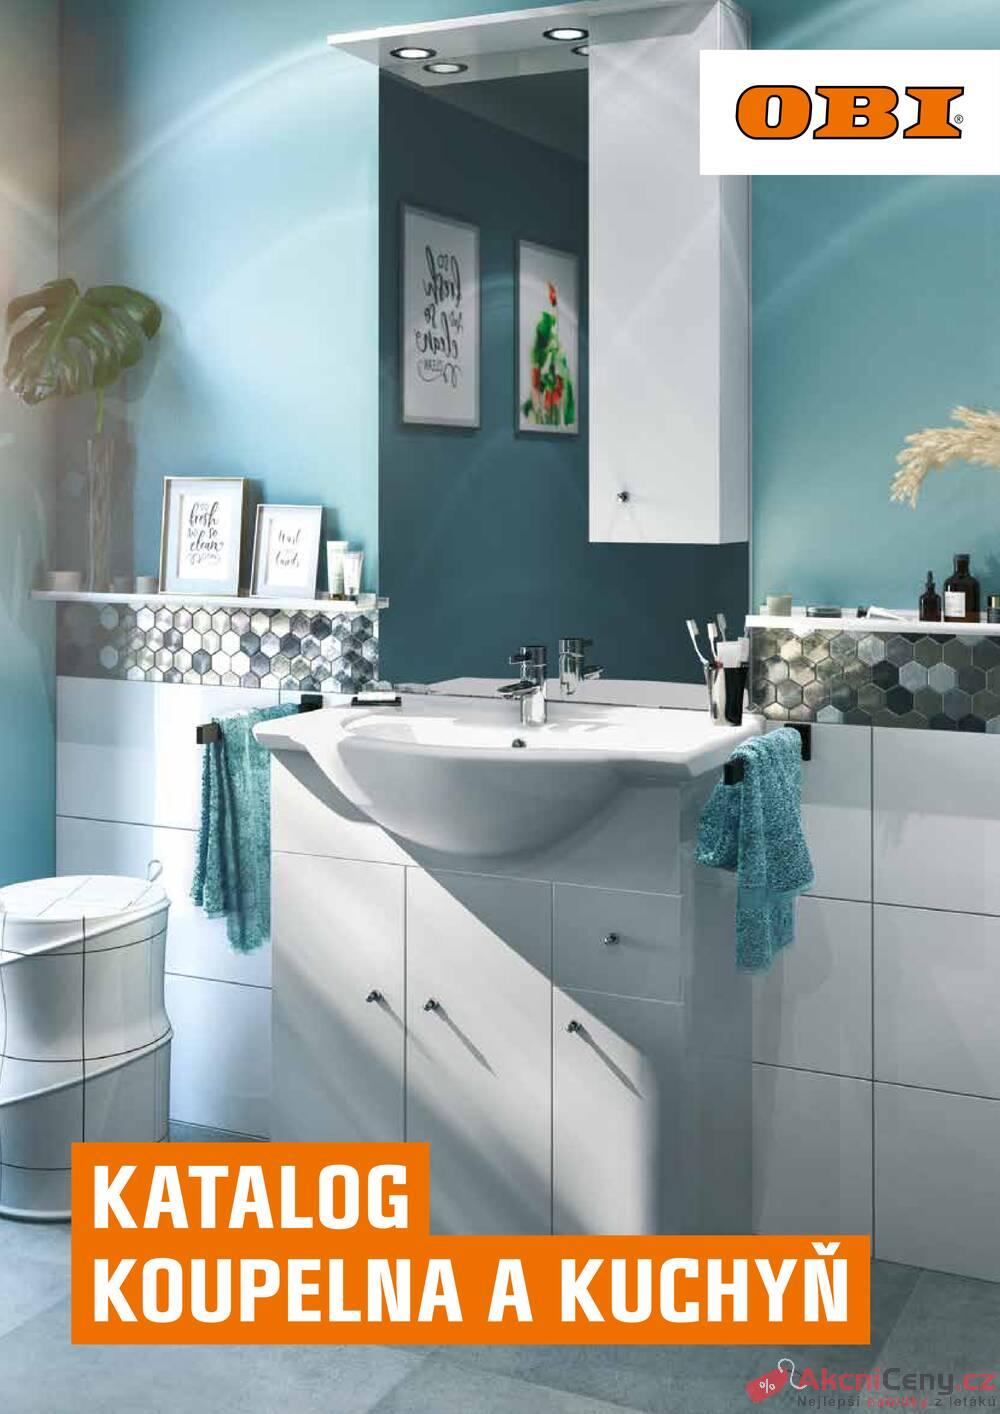 Leták OBI - OBI katalog Koupelna a kuchyň 1.7. - 31.12. - strana 1